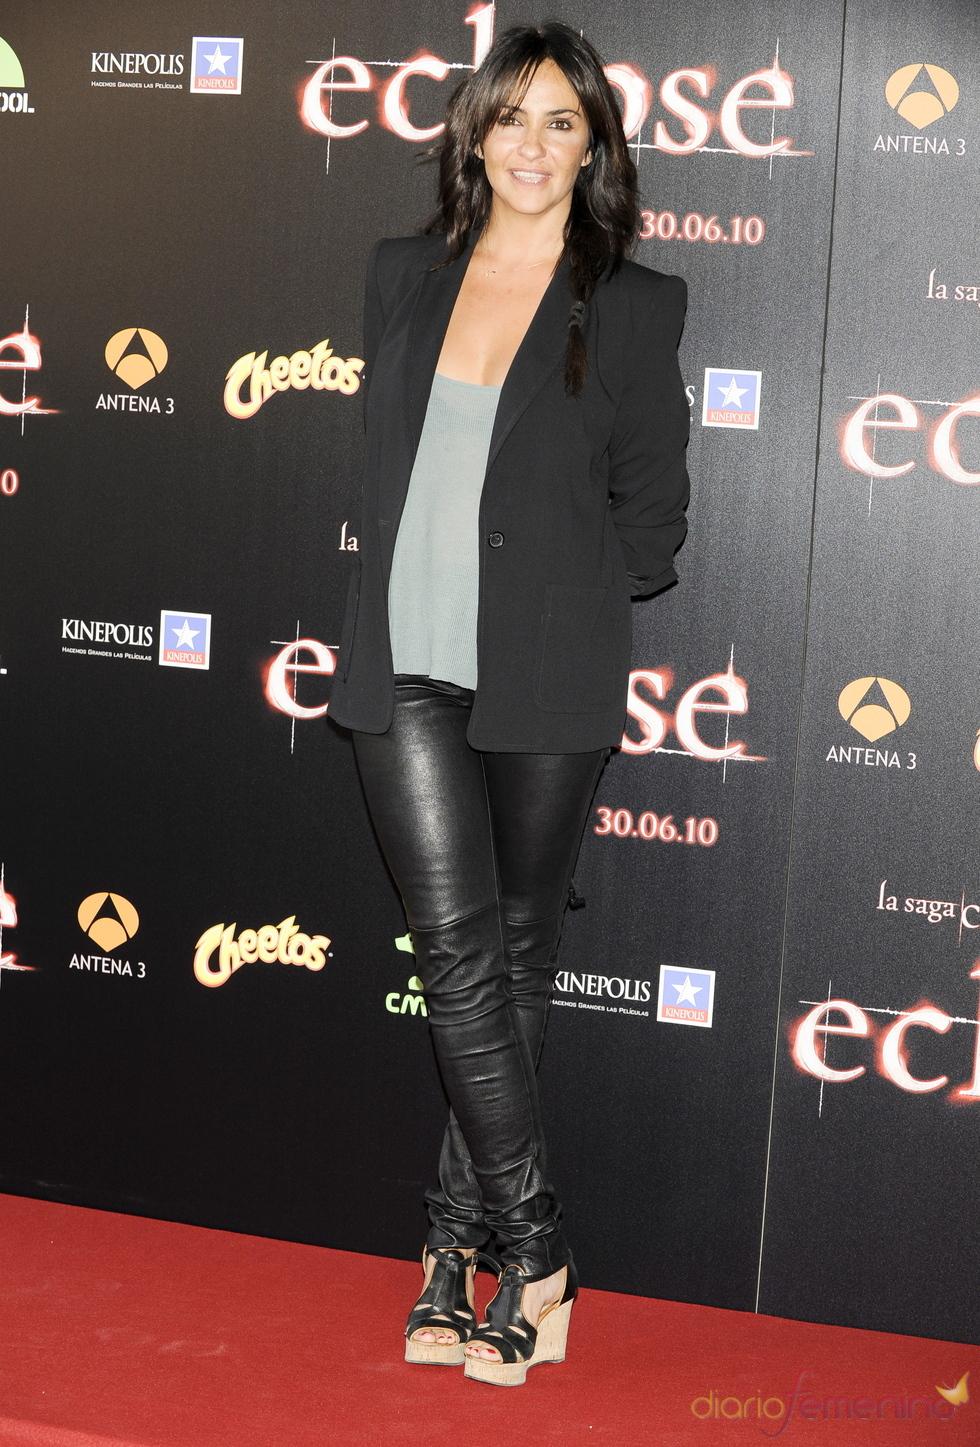 Melani Olivares en la premiere de 'Eclipse' en Madrid